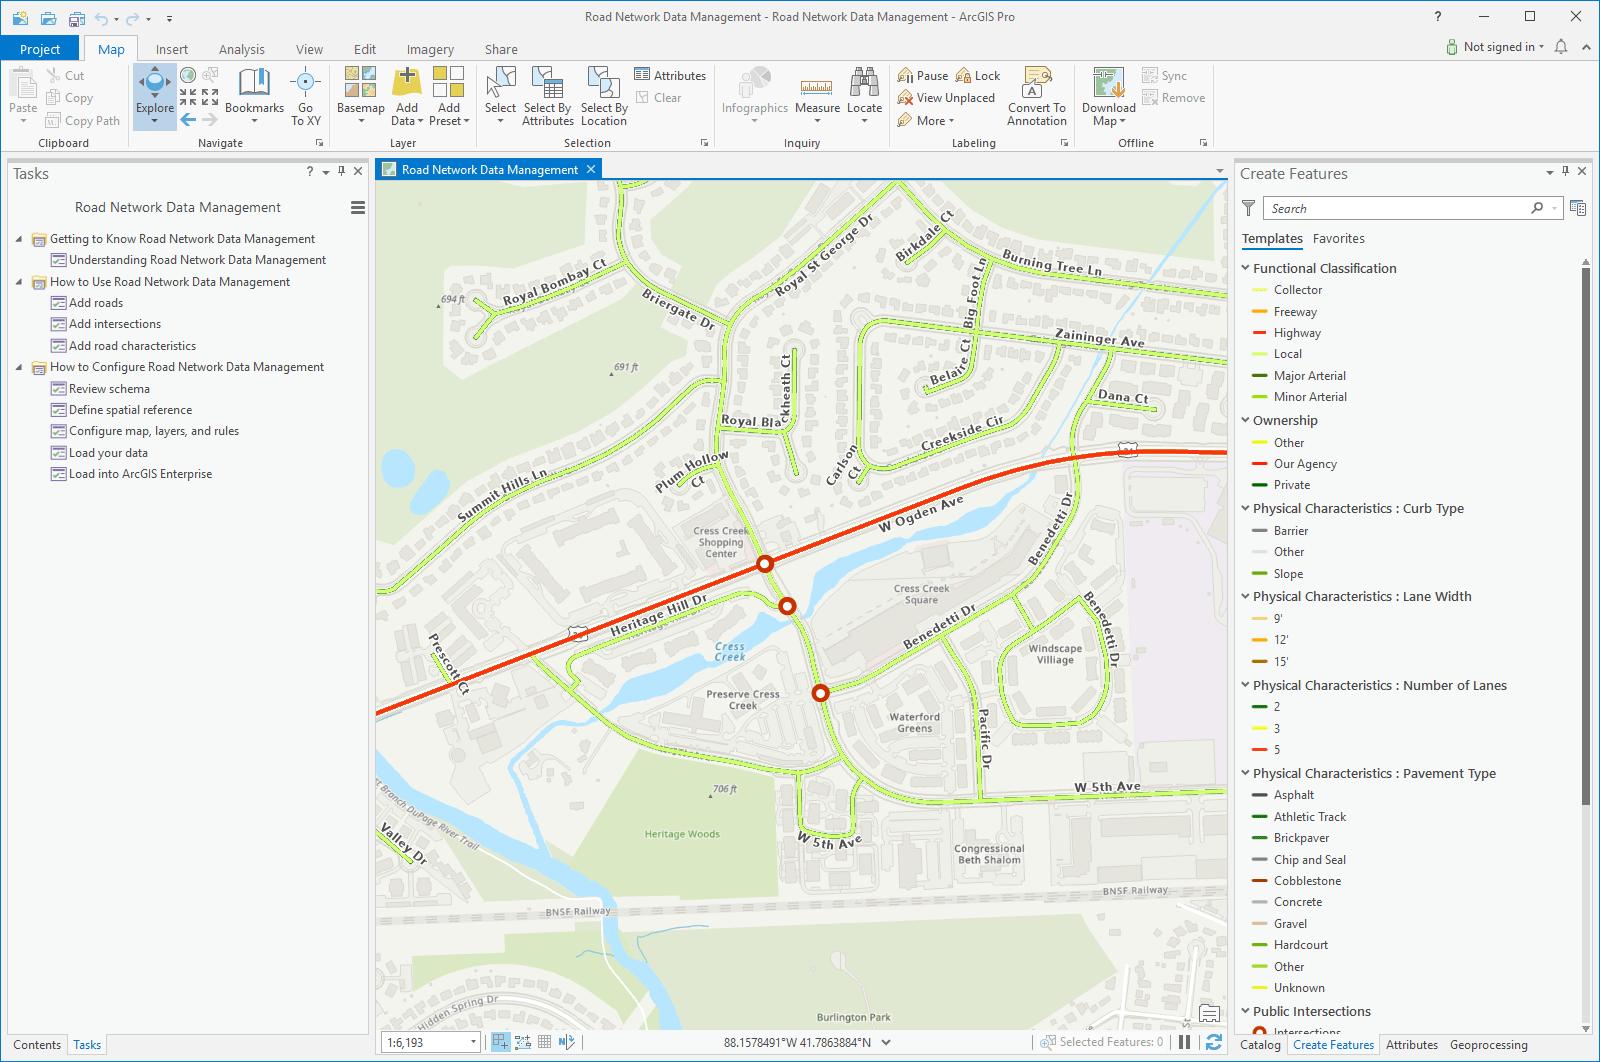 Road Network Data Management